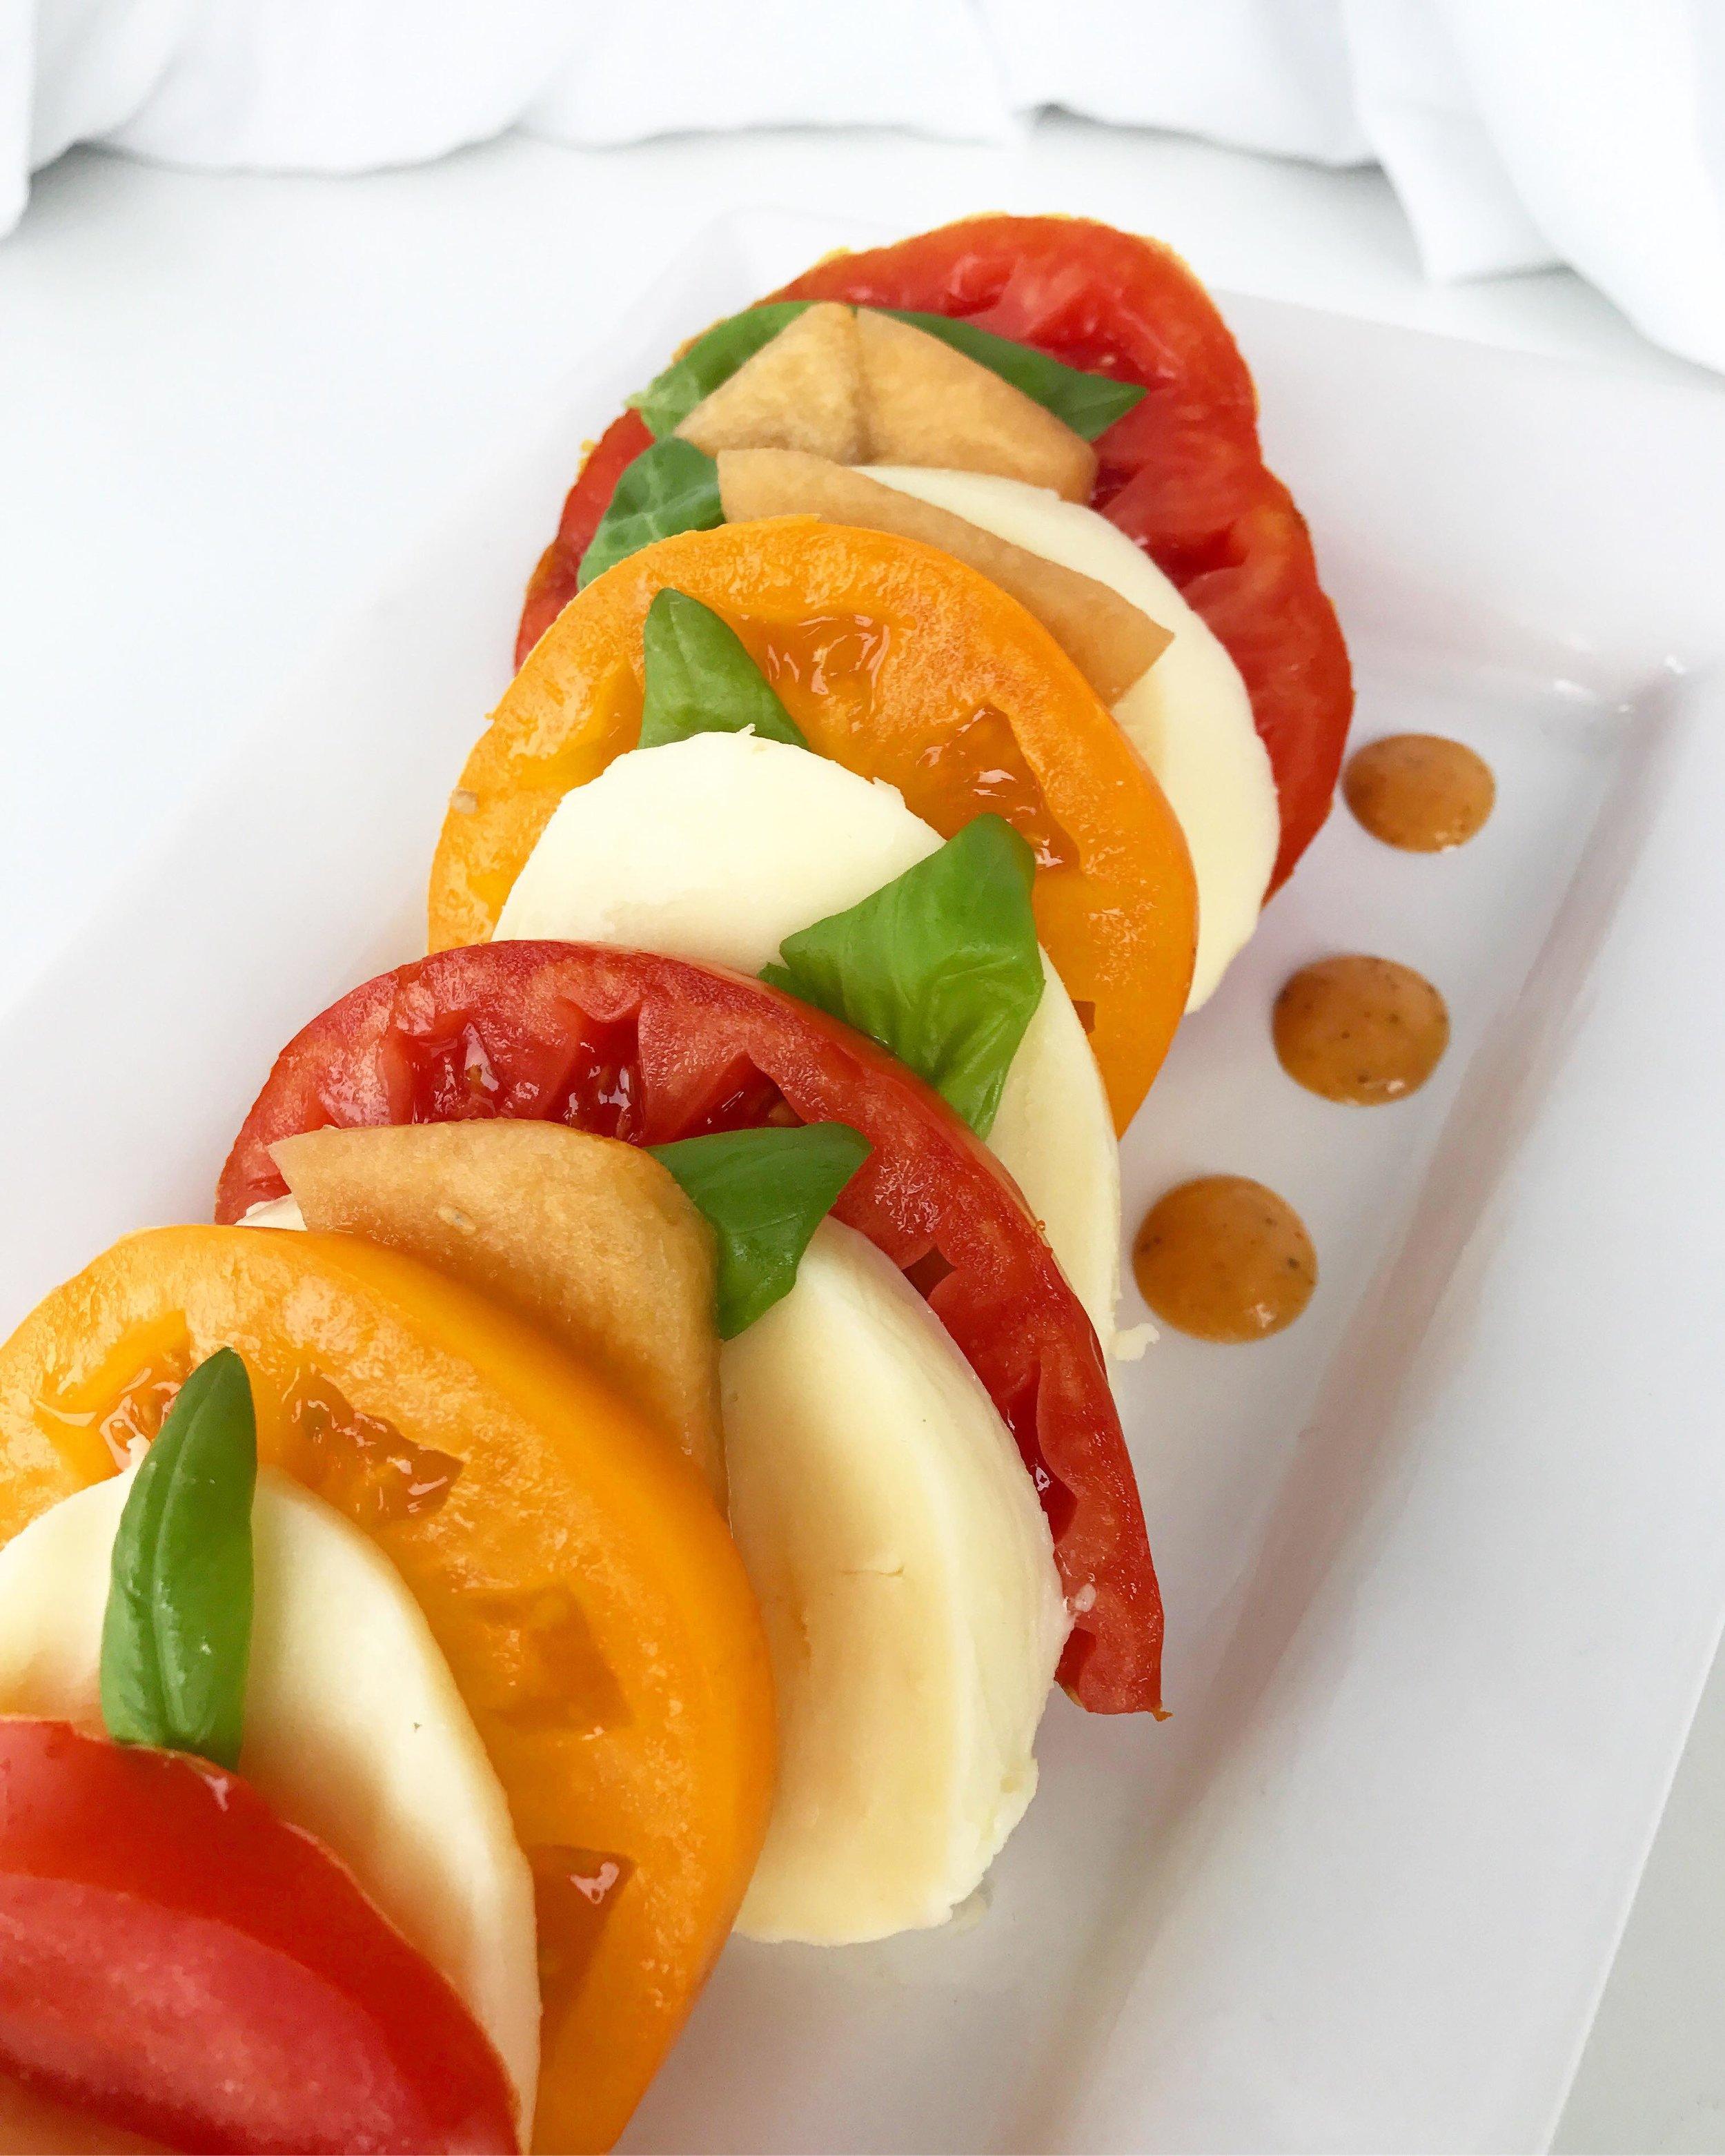 caprese Melon & Heirloom Tomato SALAD - with Smoked Tomato Vinaigrette